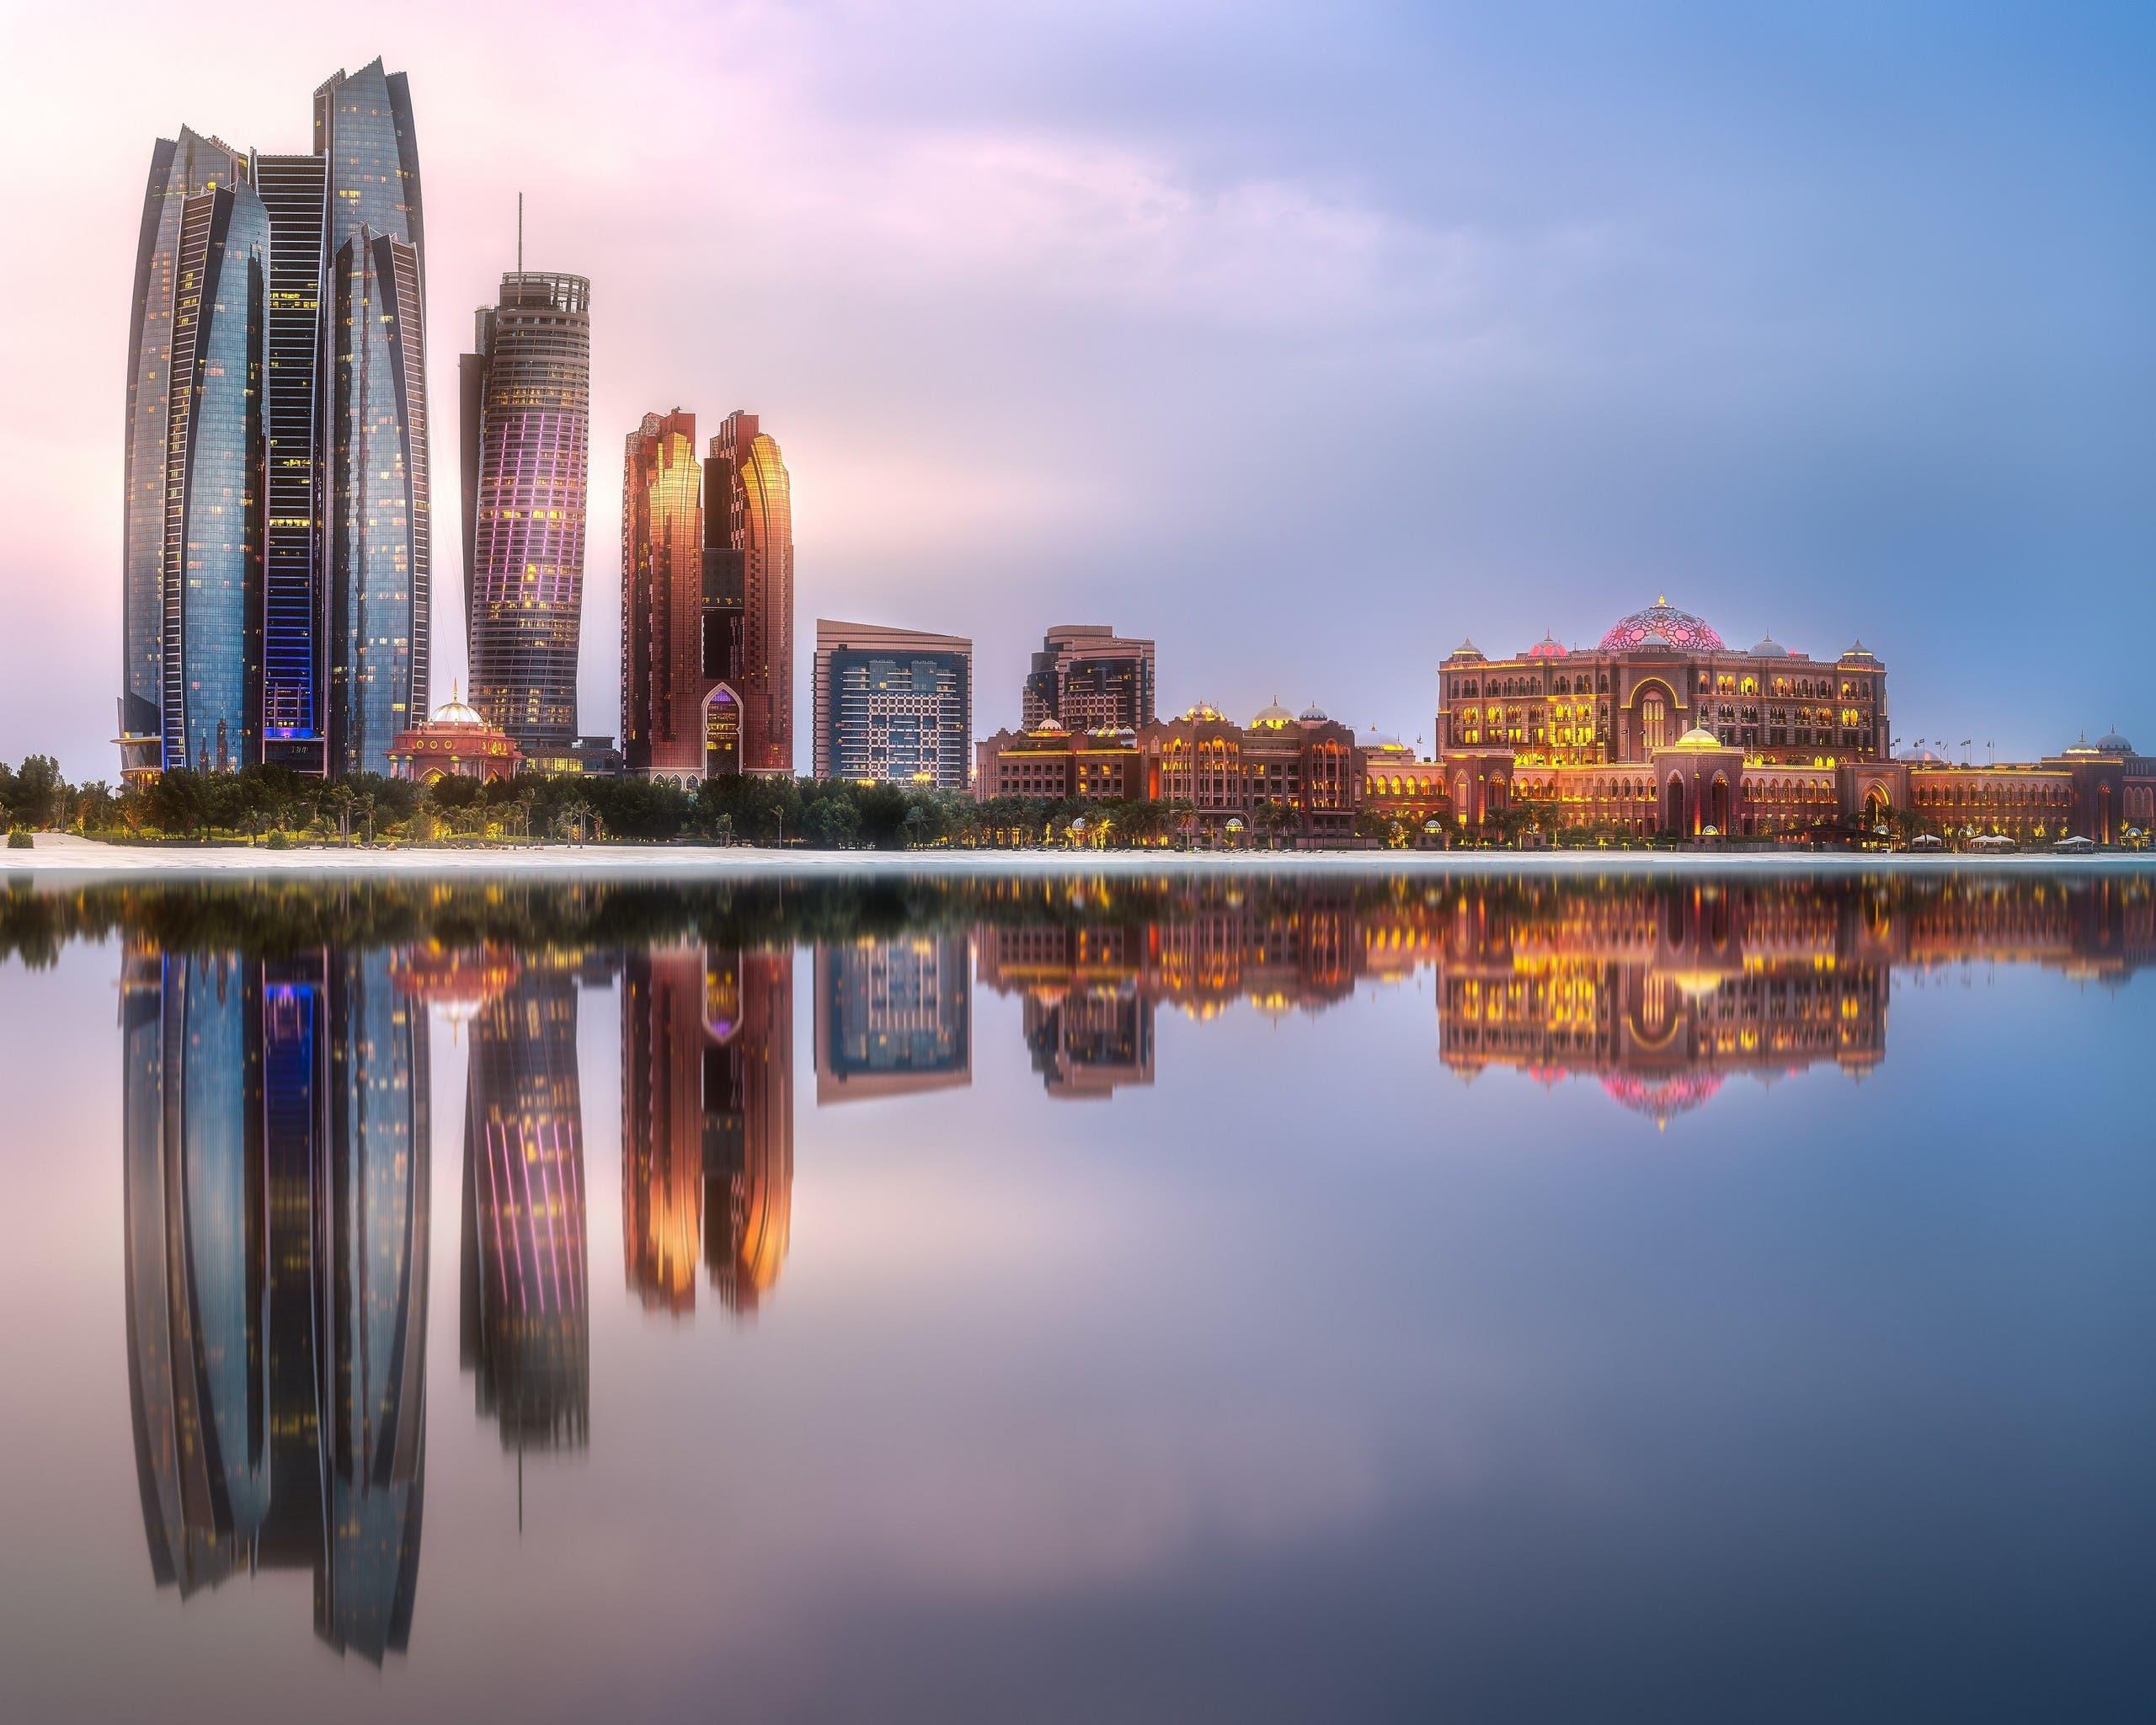 A view of Abu dhabi's Emirates Palace. (WAM)